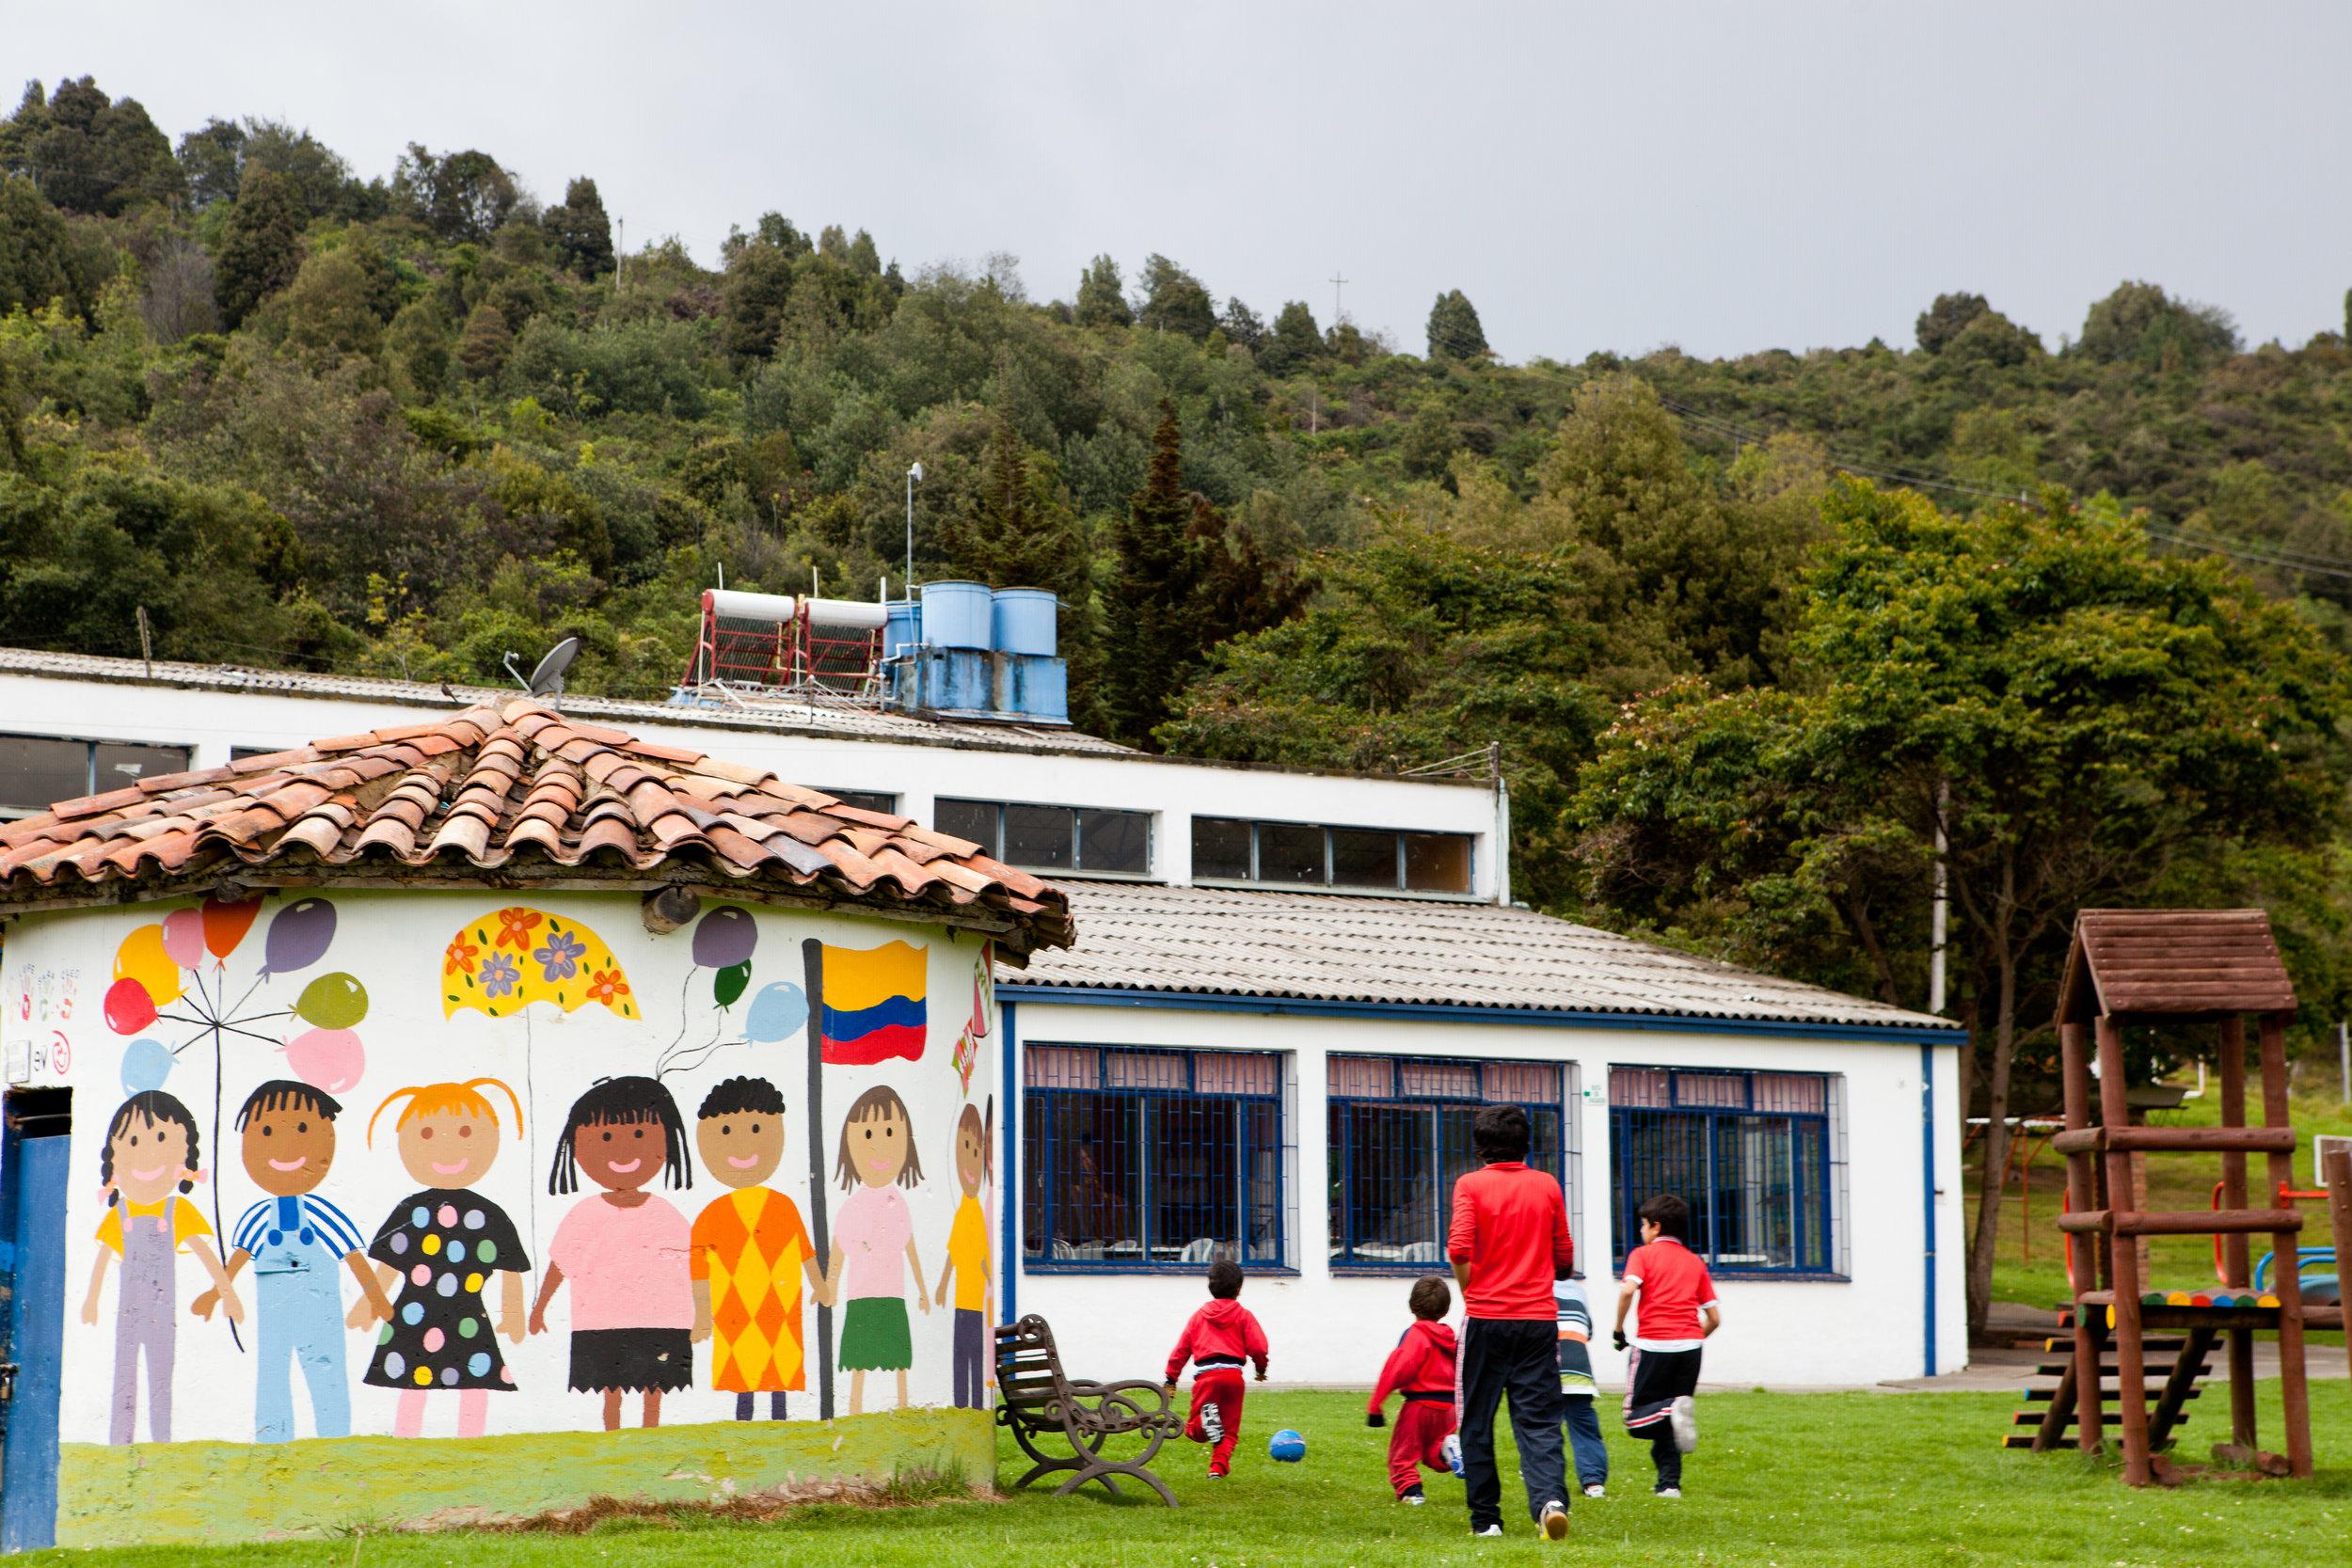 Colombia San Mauricio